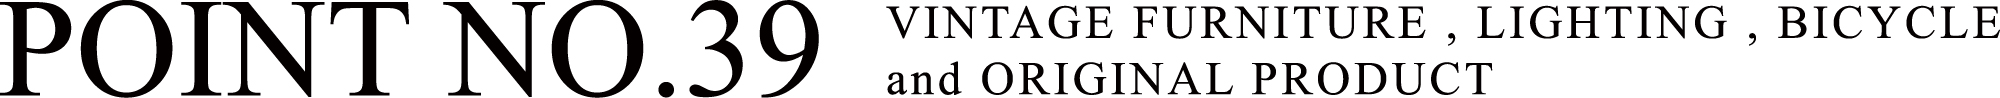 POINT NO.39   東京・目黒 ヴィンテージ家具 照明 真鍮無垢材を使用したオリジナル照明